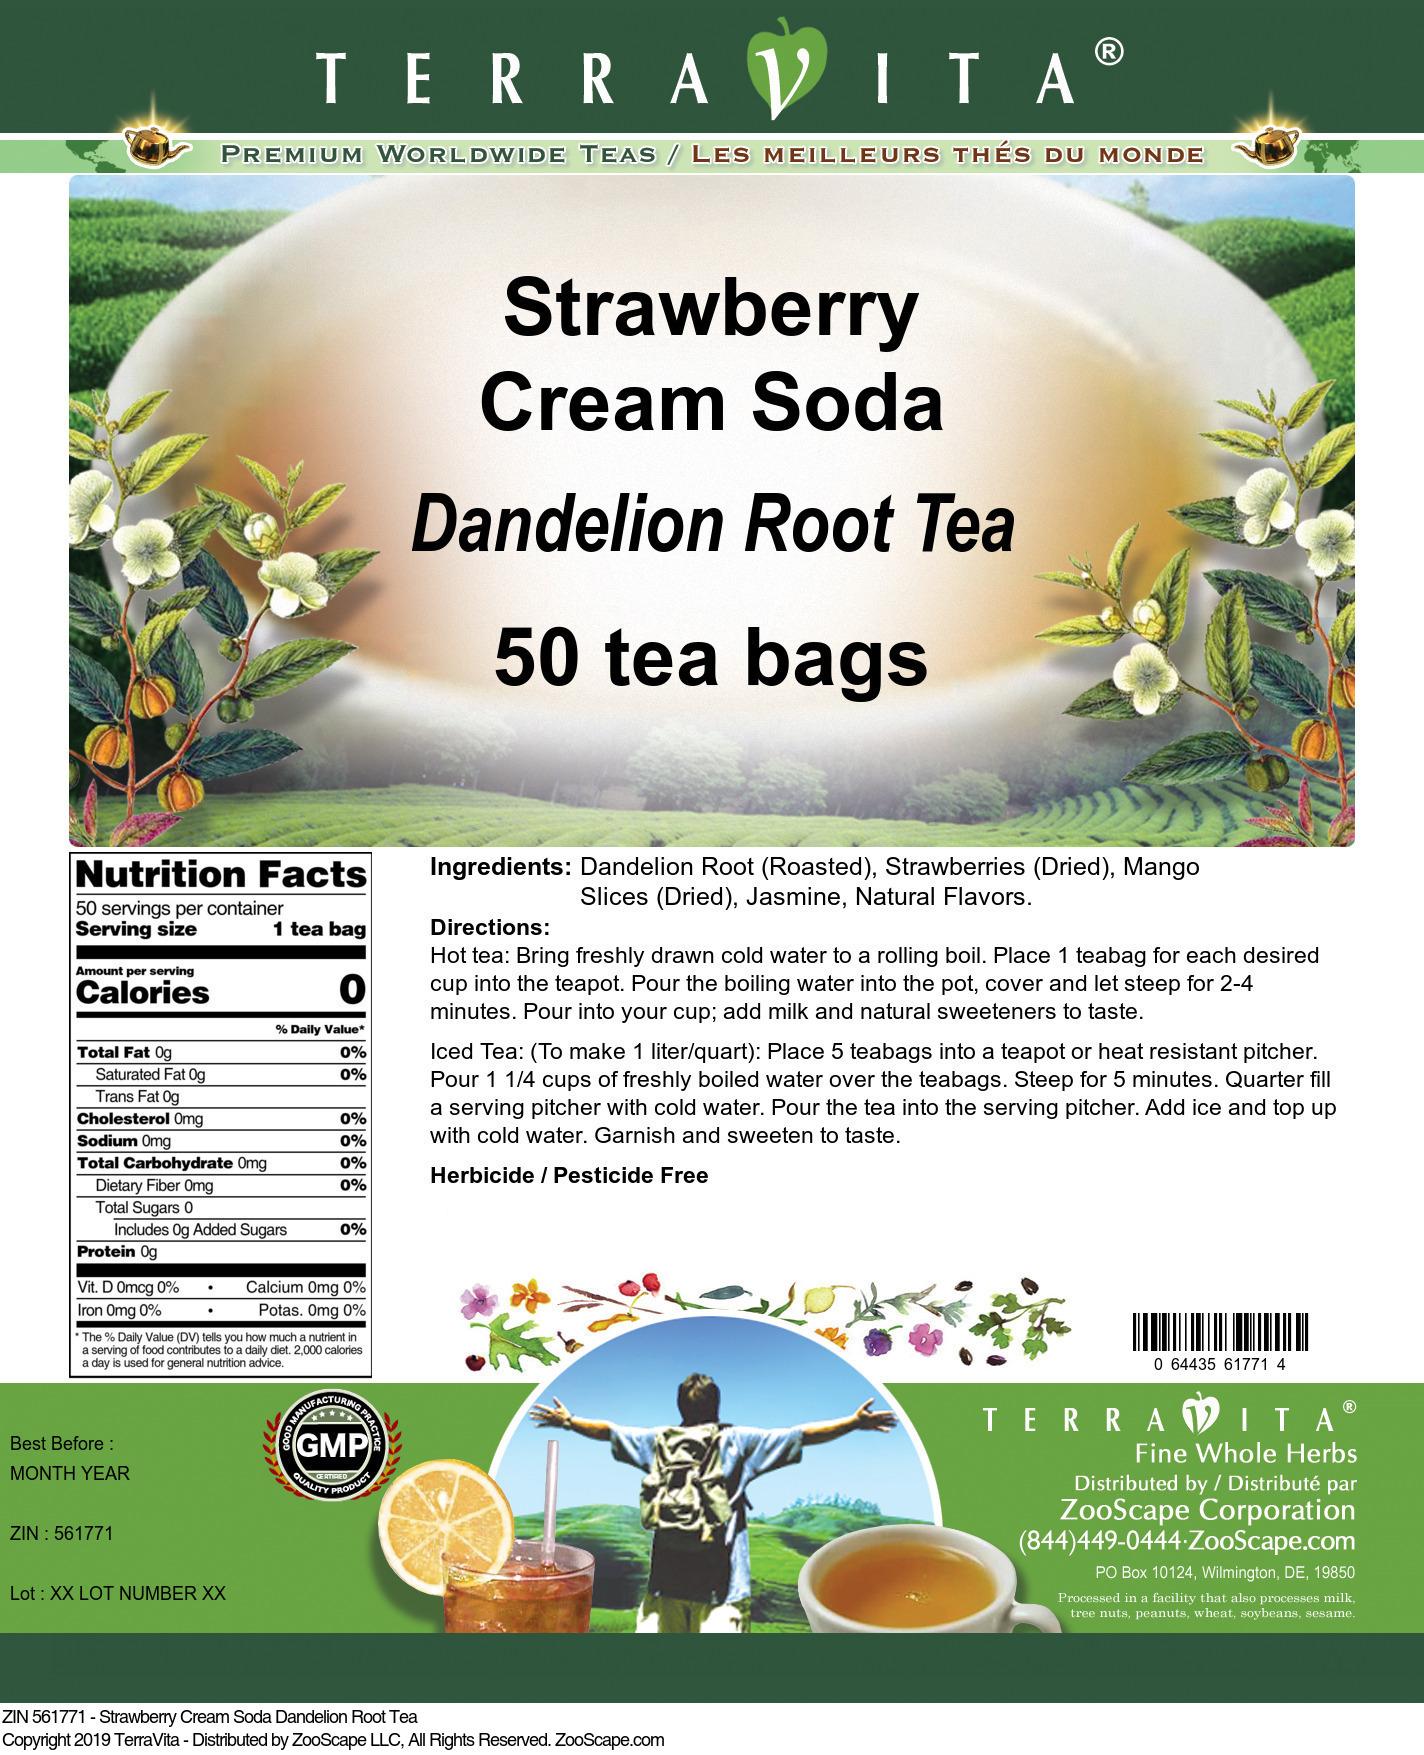 Strawberry Cream Soda Dandelion Root